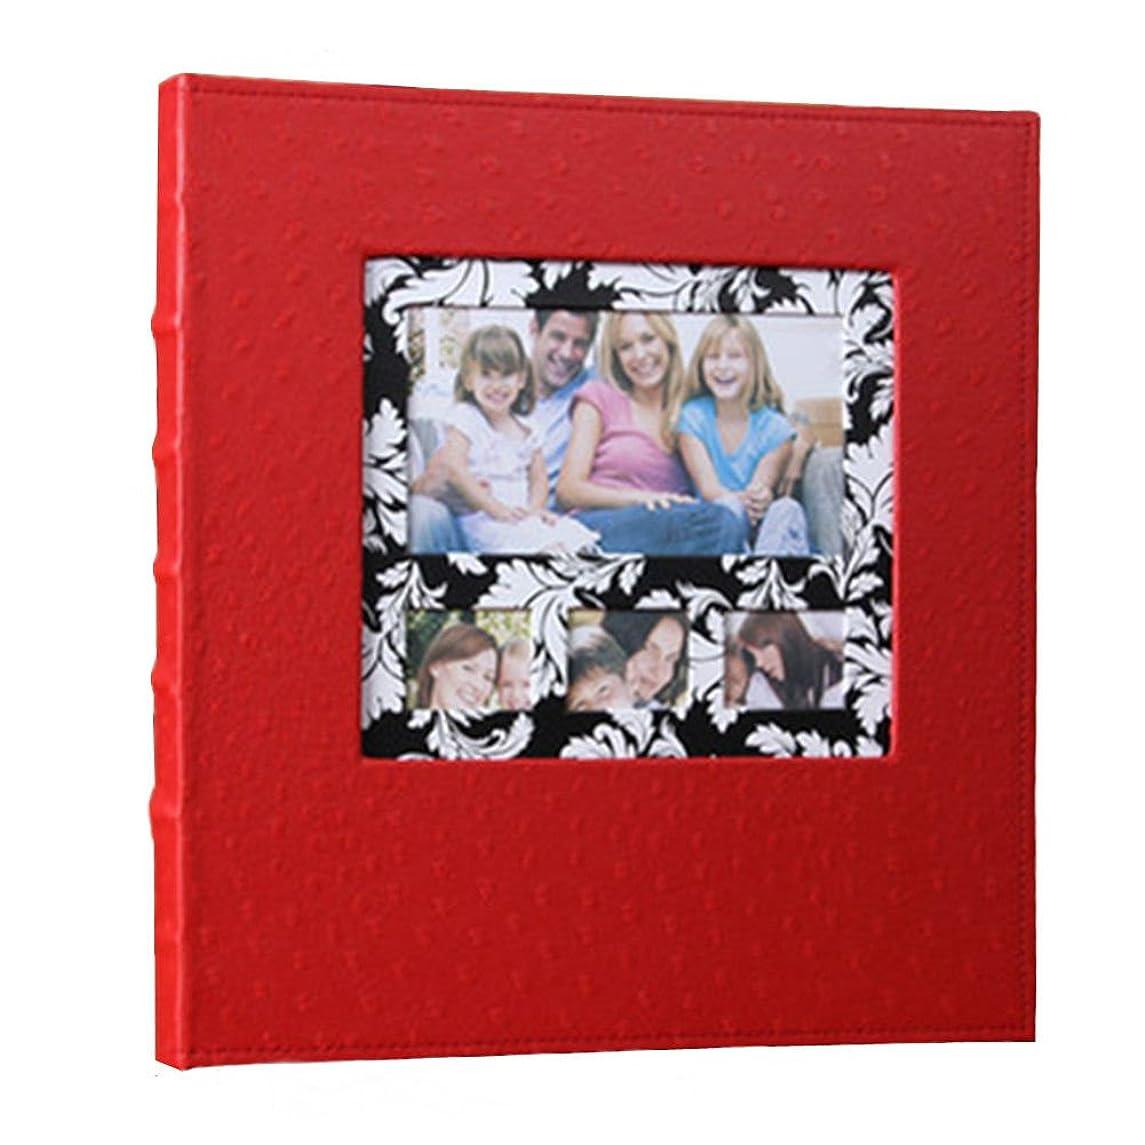 Xerhnan Leather Frame Cover Photo Album 600 Pockets Hold 4x6 Photos.Color: Red.